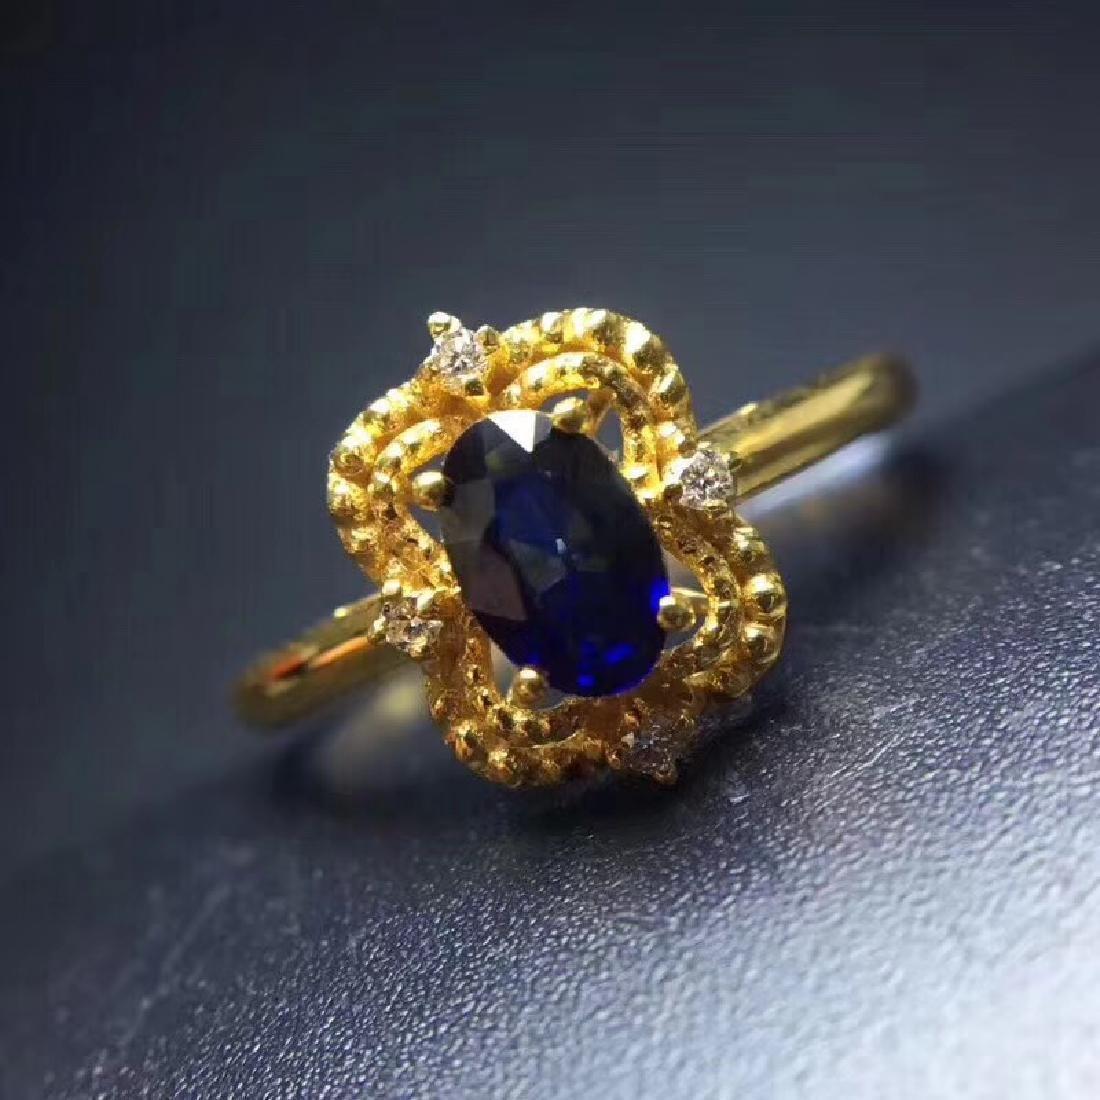 0.50 CTW Sapphire & VS Diamond Ring 18K - 8